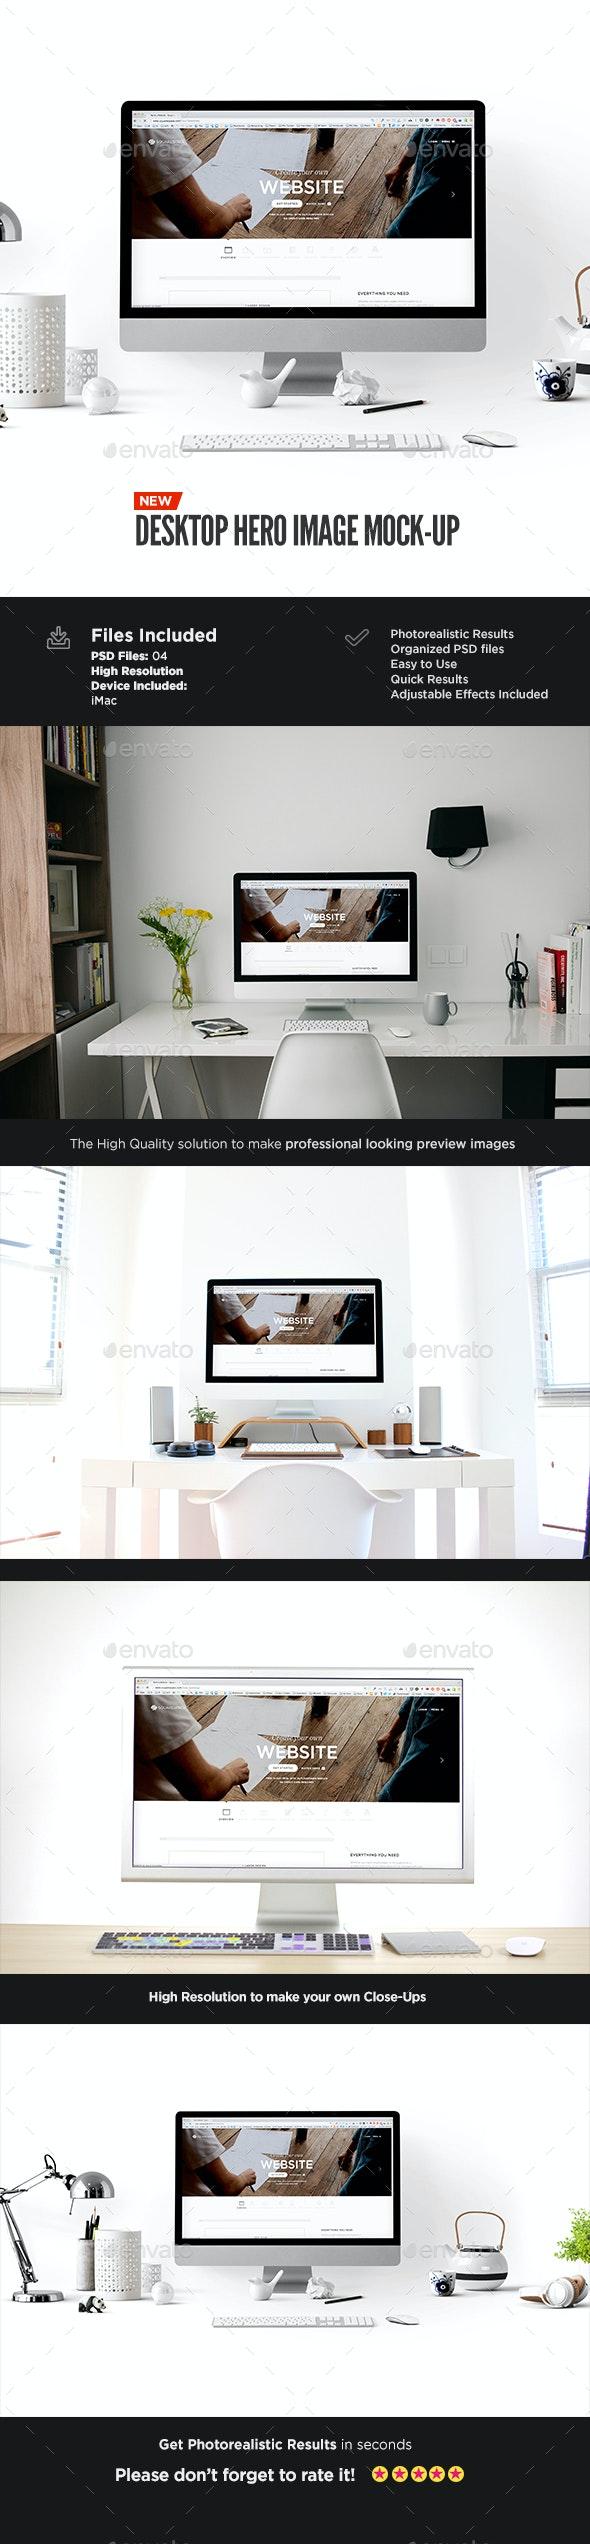 Desktop Mockup Psd 2 - Displays Product Mock-Ups